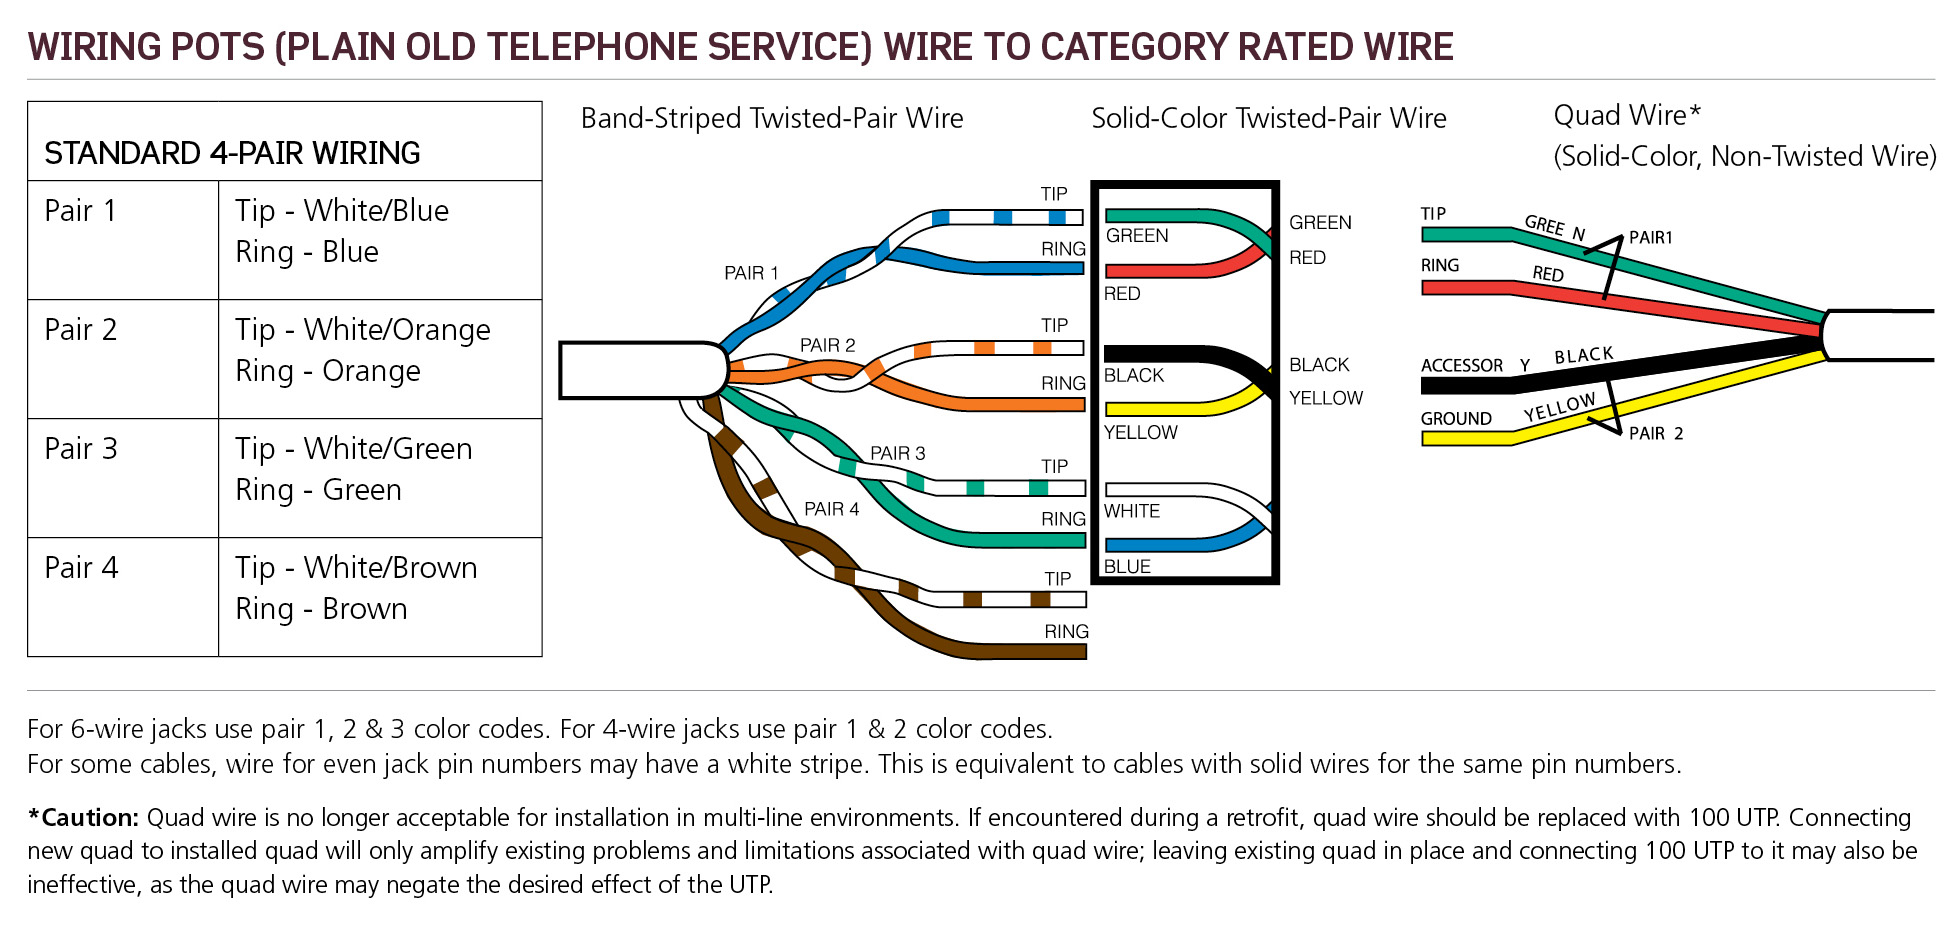 medium resolution of cat 5 telephone wiring wiring diagram portal cat 6 wiring diagram cat 5 telephone wiring diagram